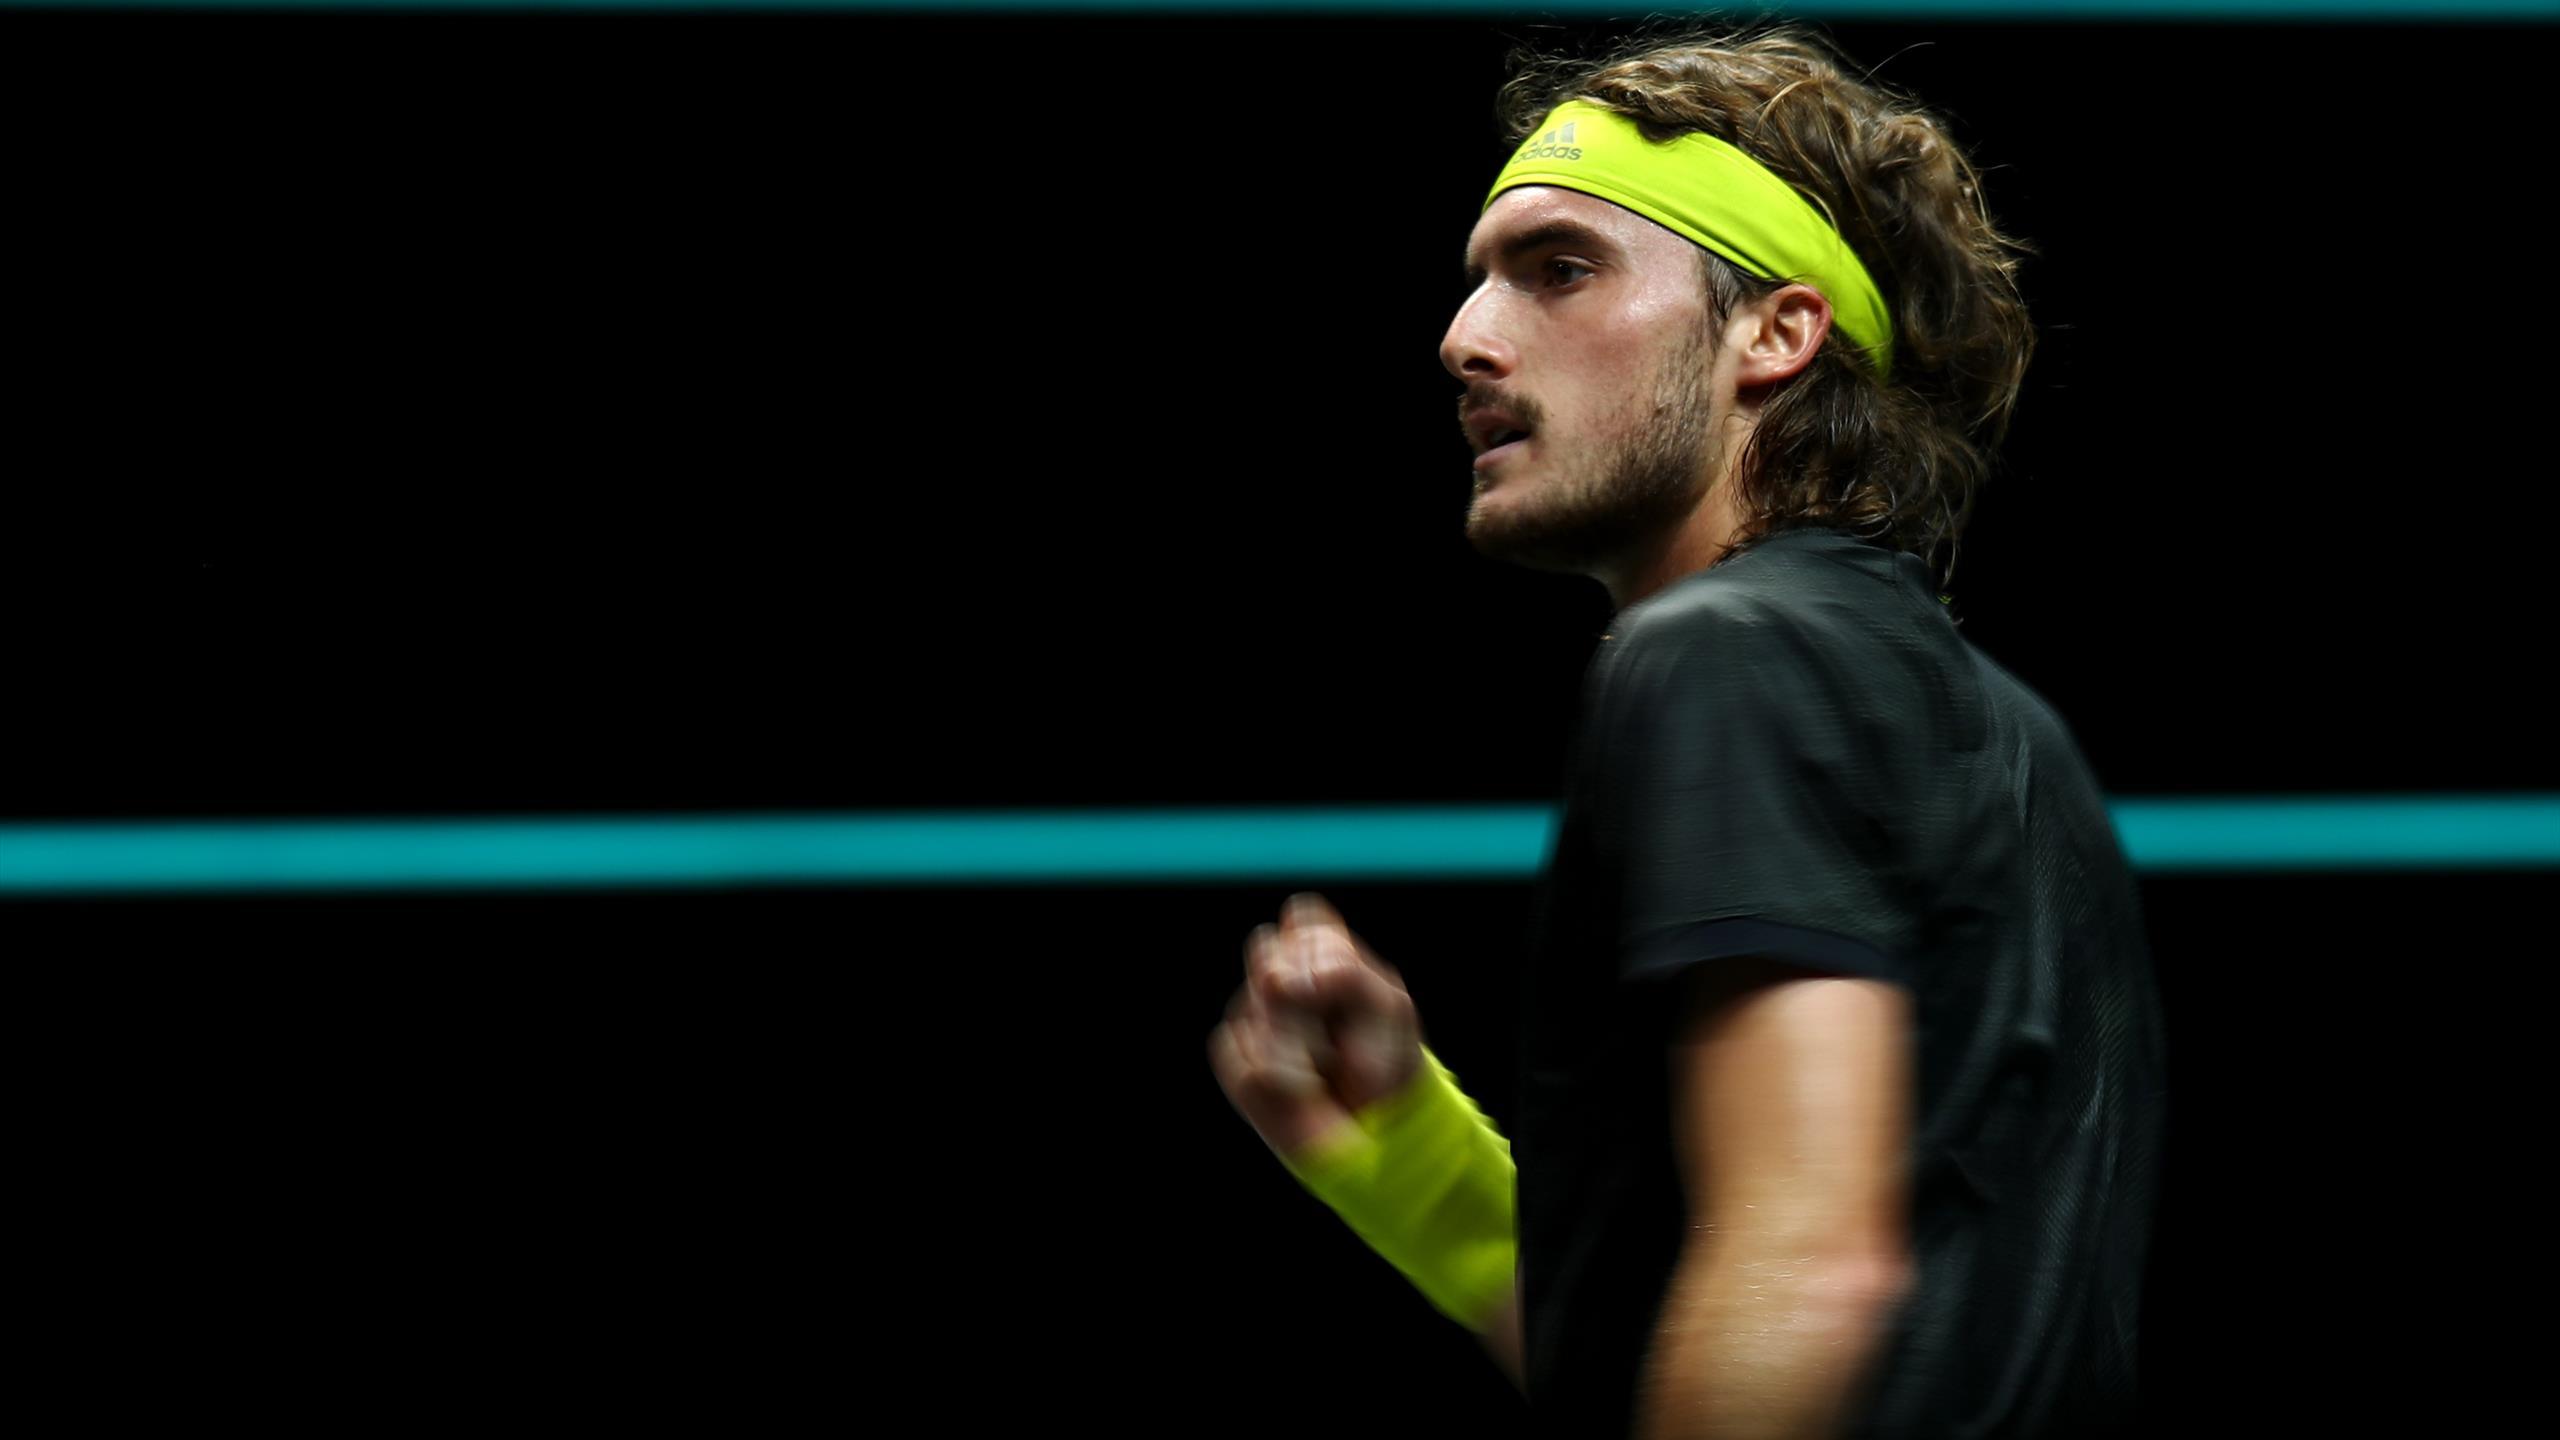 Classement <b>ATP</b> : Djokovic numéro 1 suprême, Tsitsipas déloge Federer du Top 5